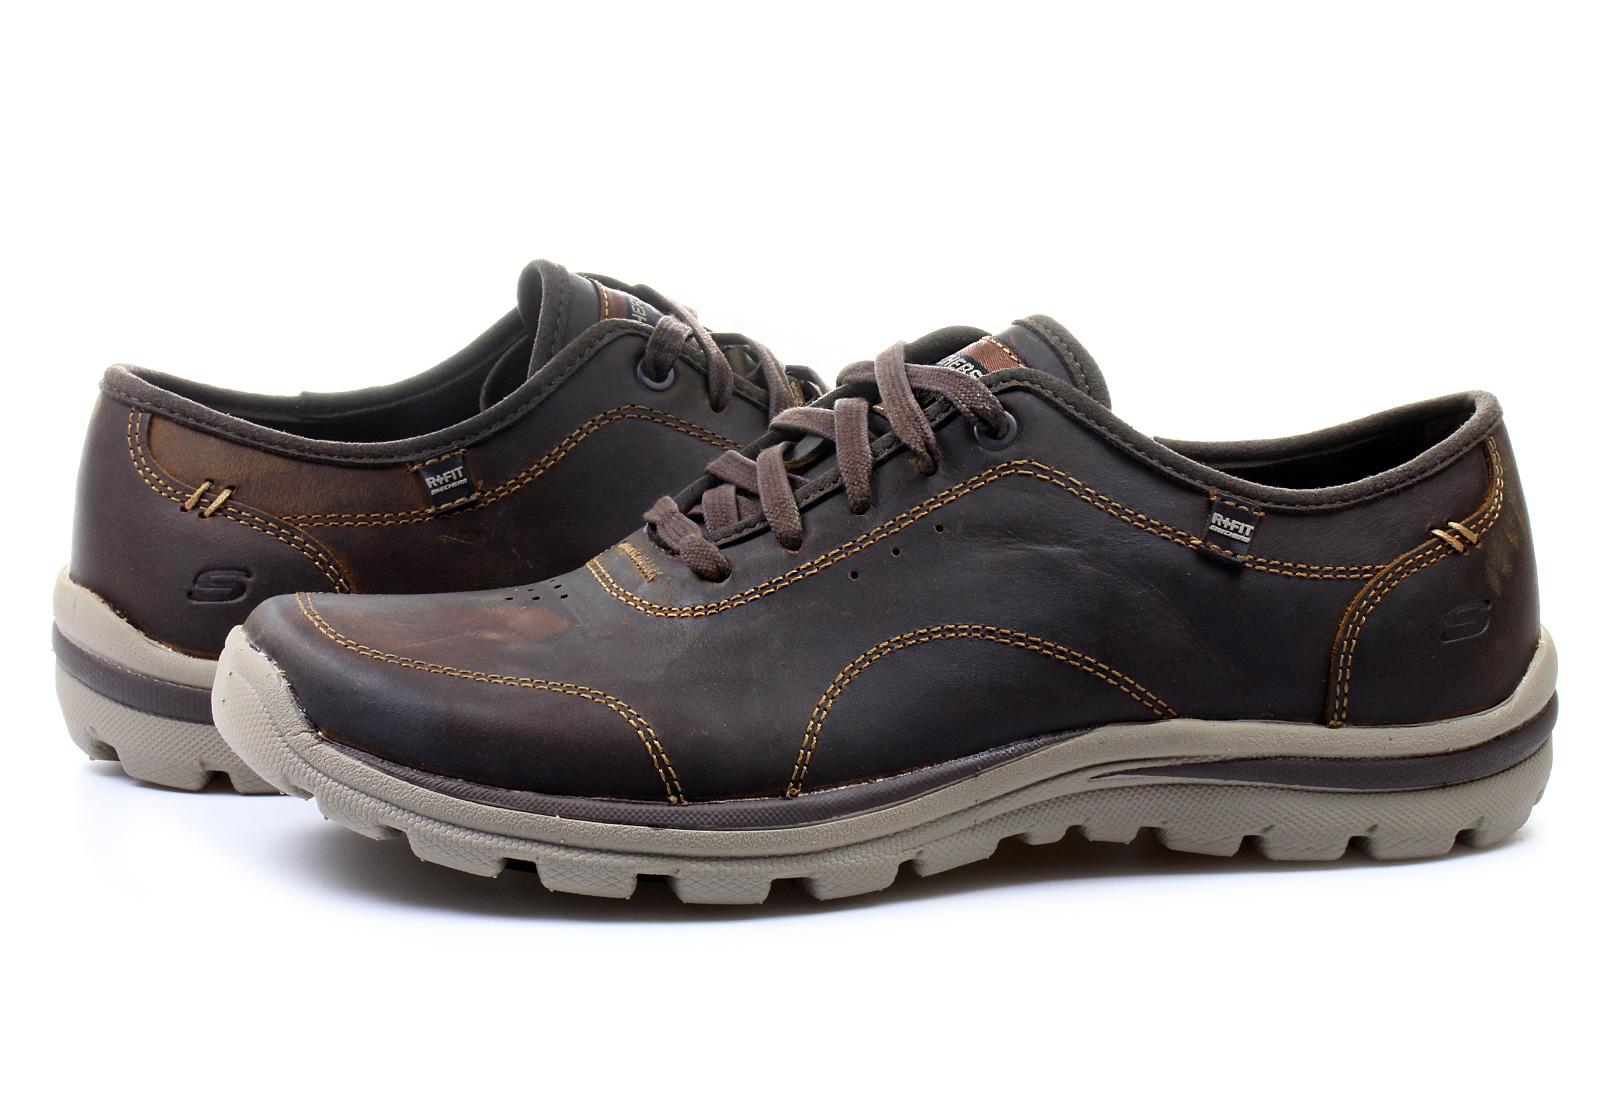 Skechers Cipő - Harvin - 64049-cdb - Office Shoes Magyarország 8b66237d16